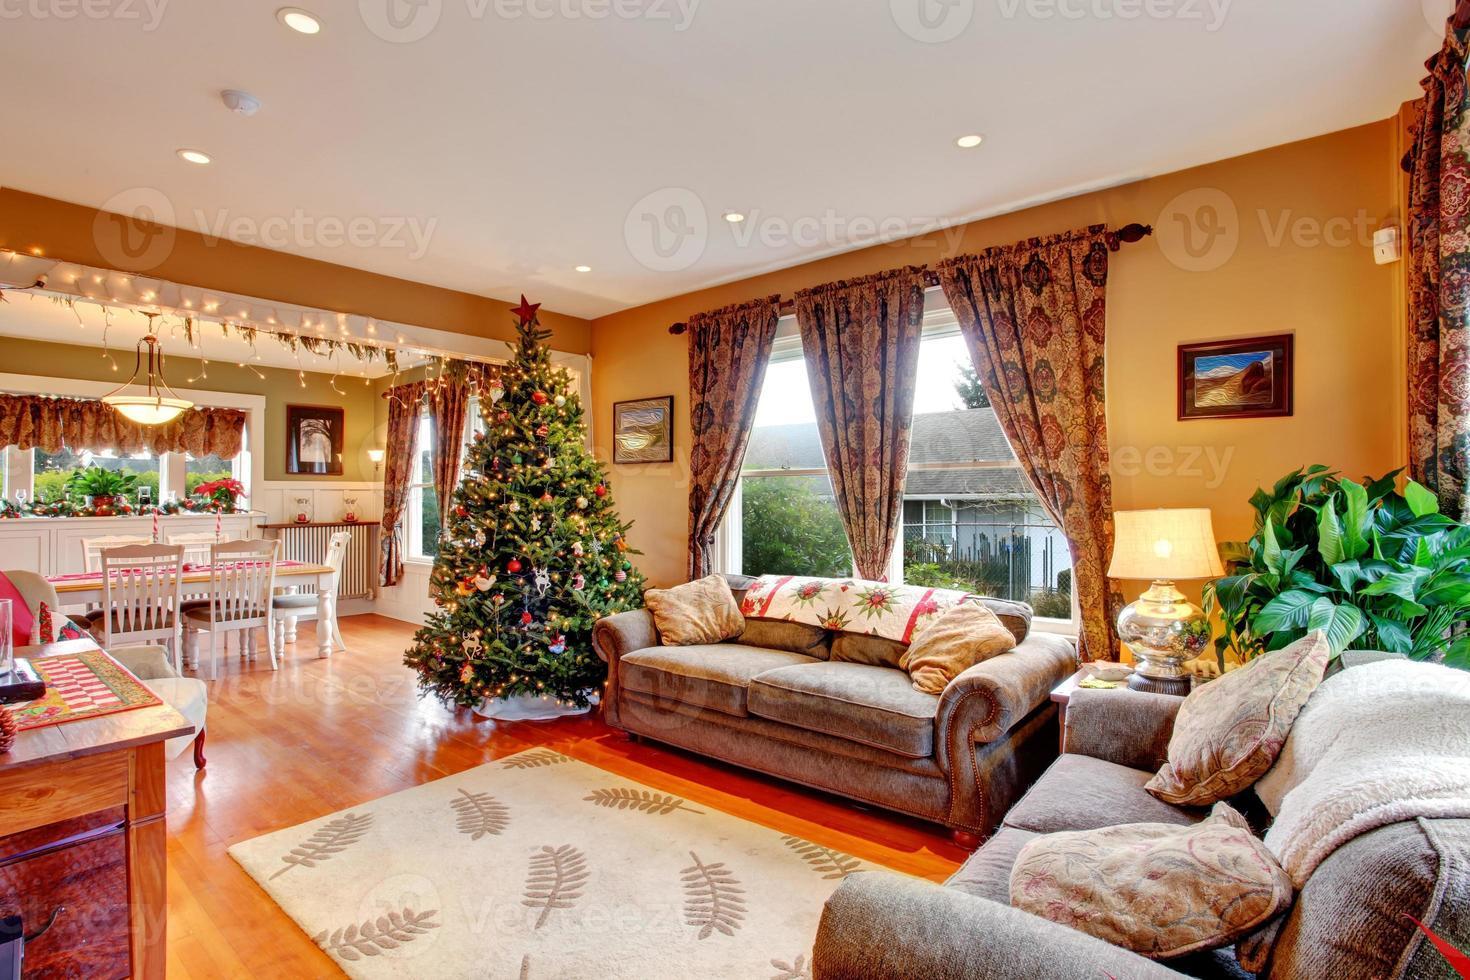 woonkamer op kerstavond foto